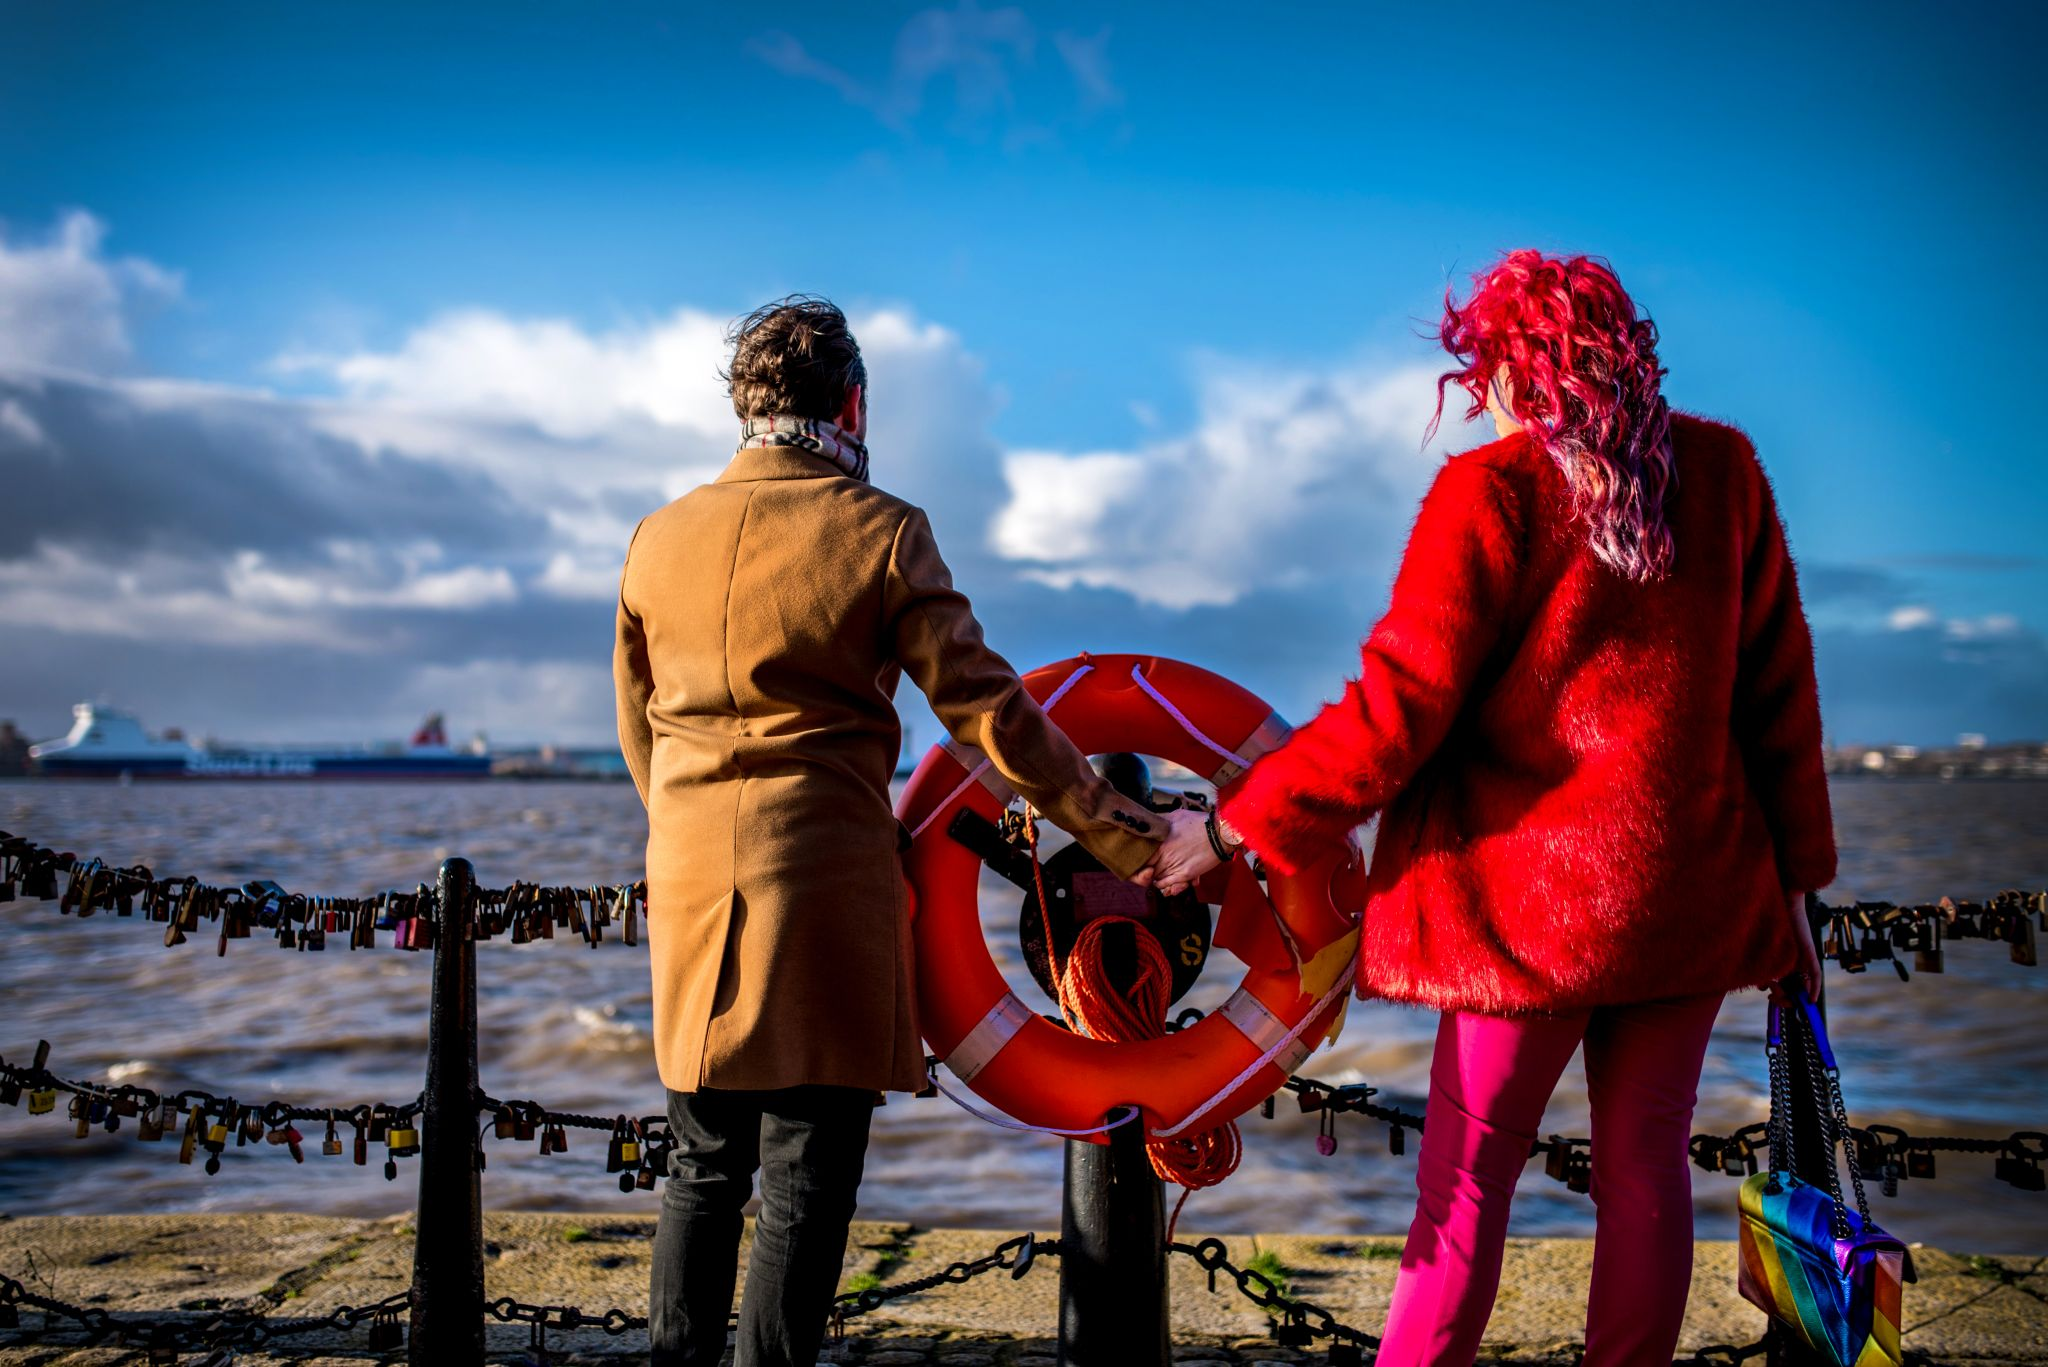 romantic couples travel photoshoot in liverpool